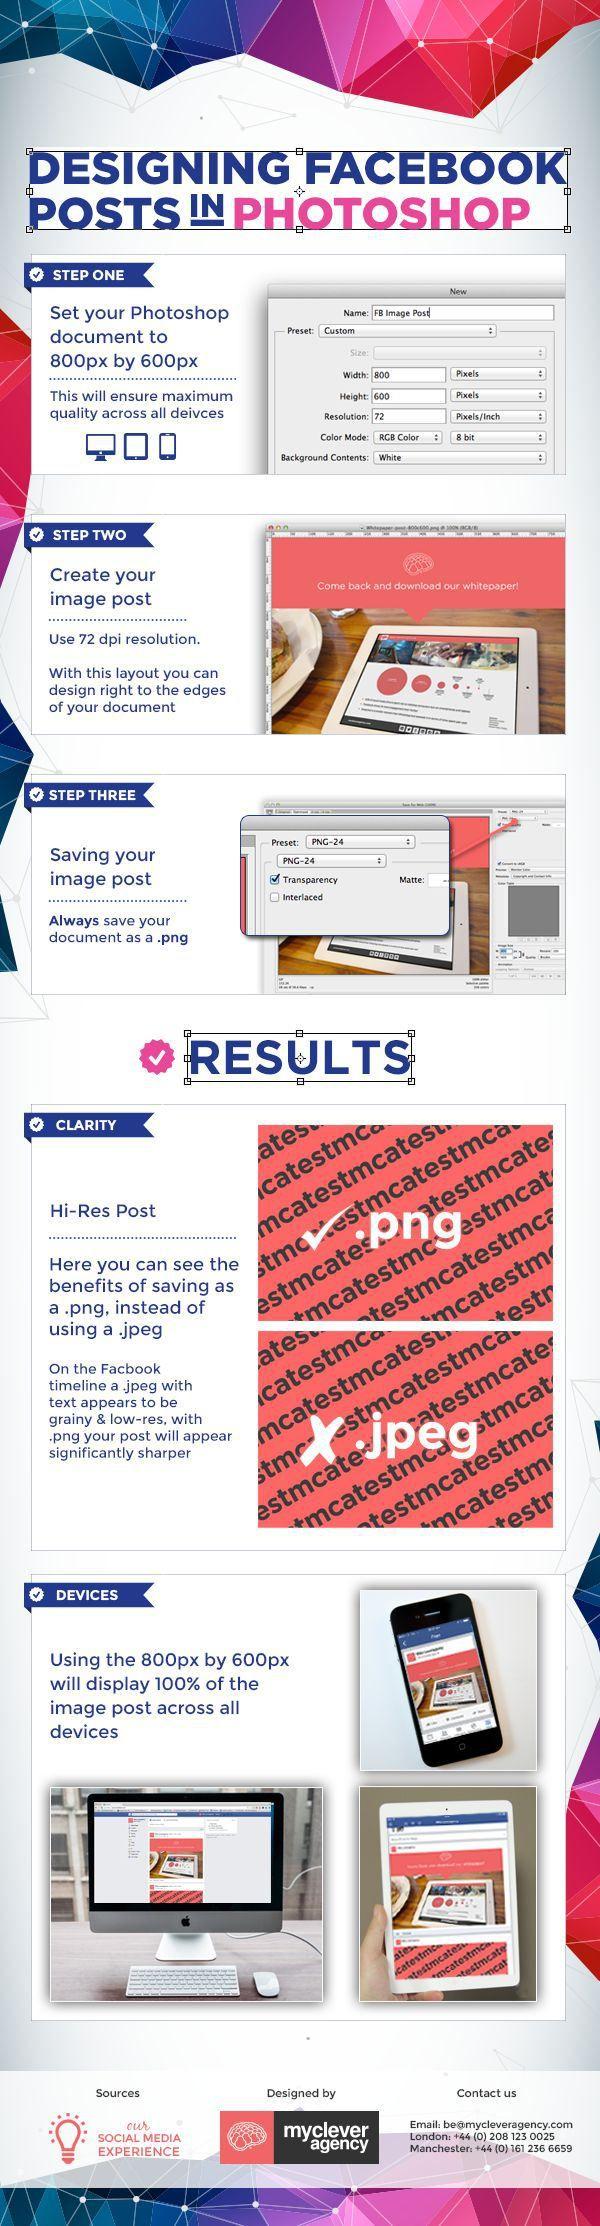 Diseñando posts de FaceBook con Photoshop #infografia #infographic #design…